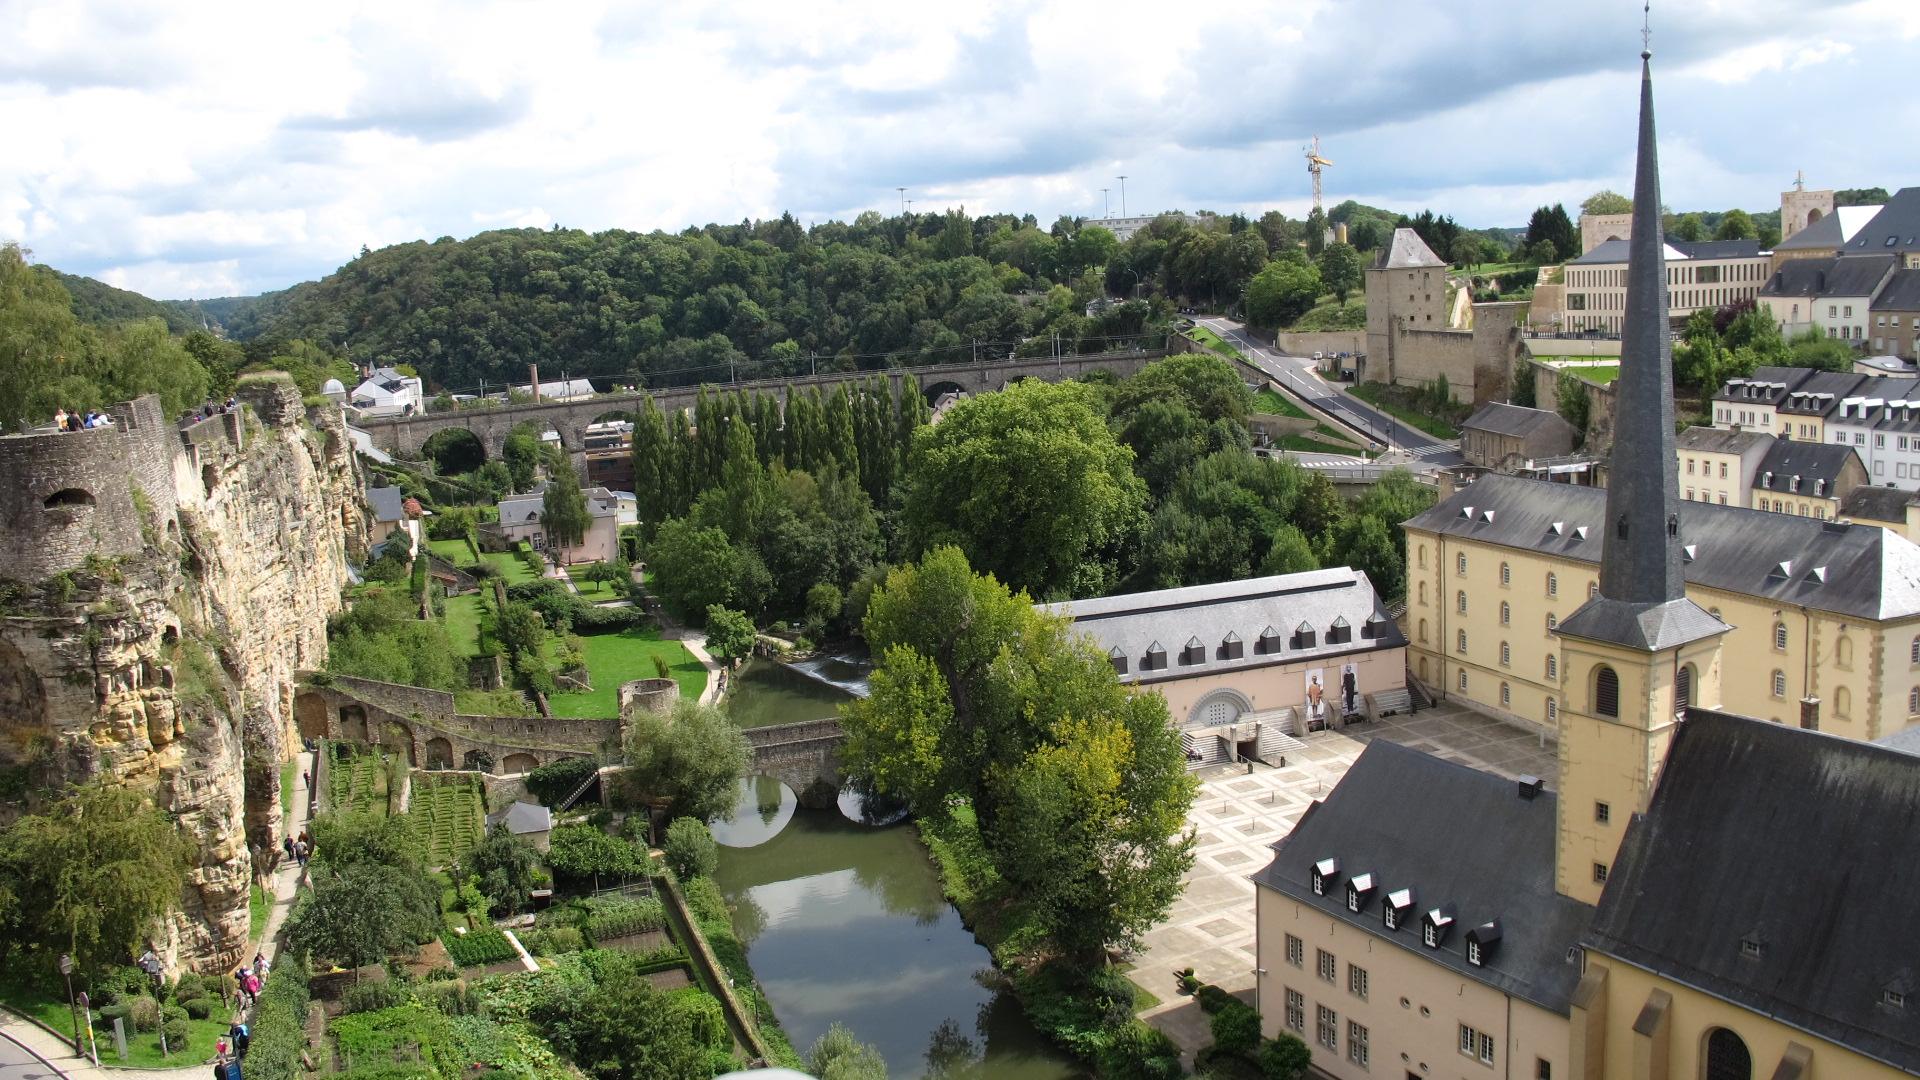 luxemburg-august-2014-066.jpg